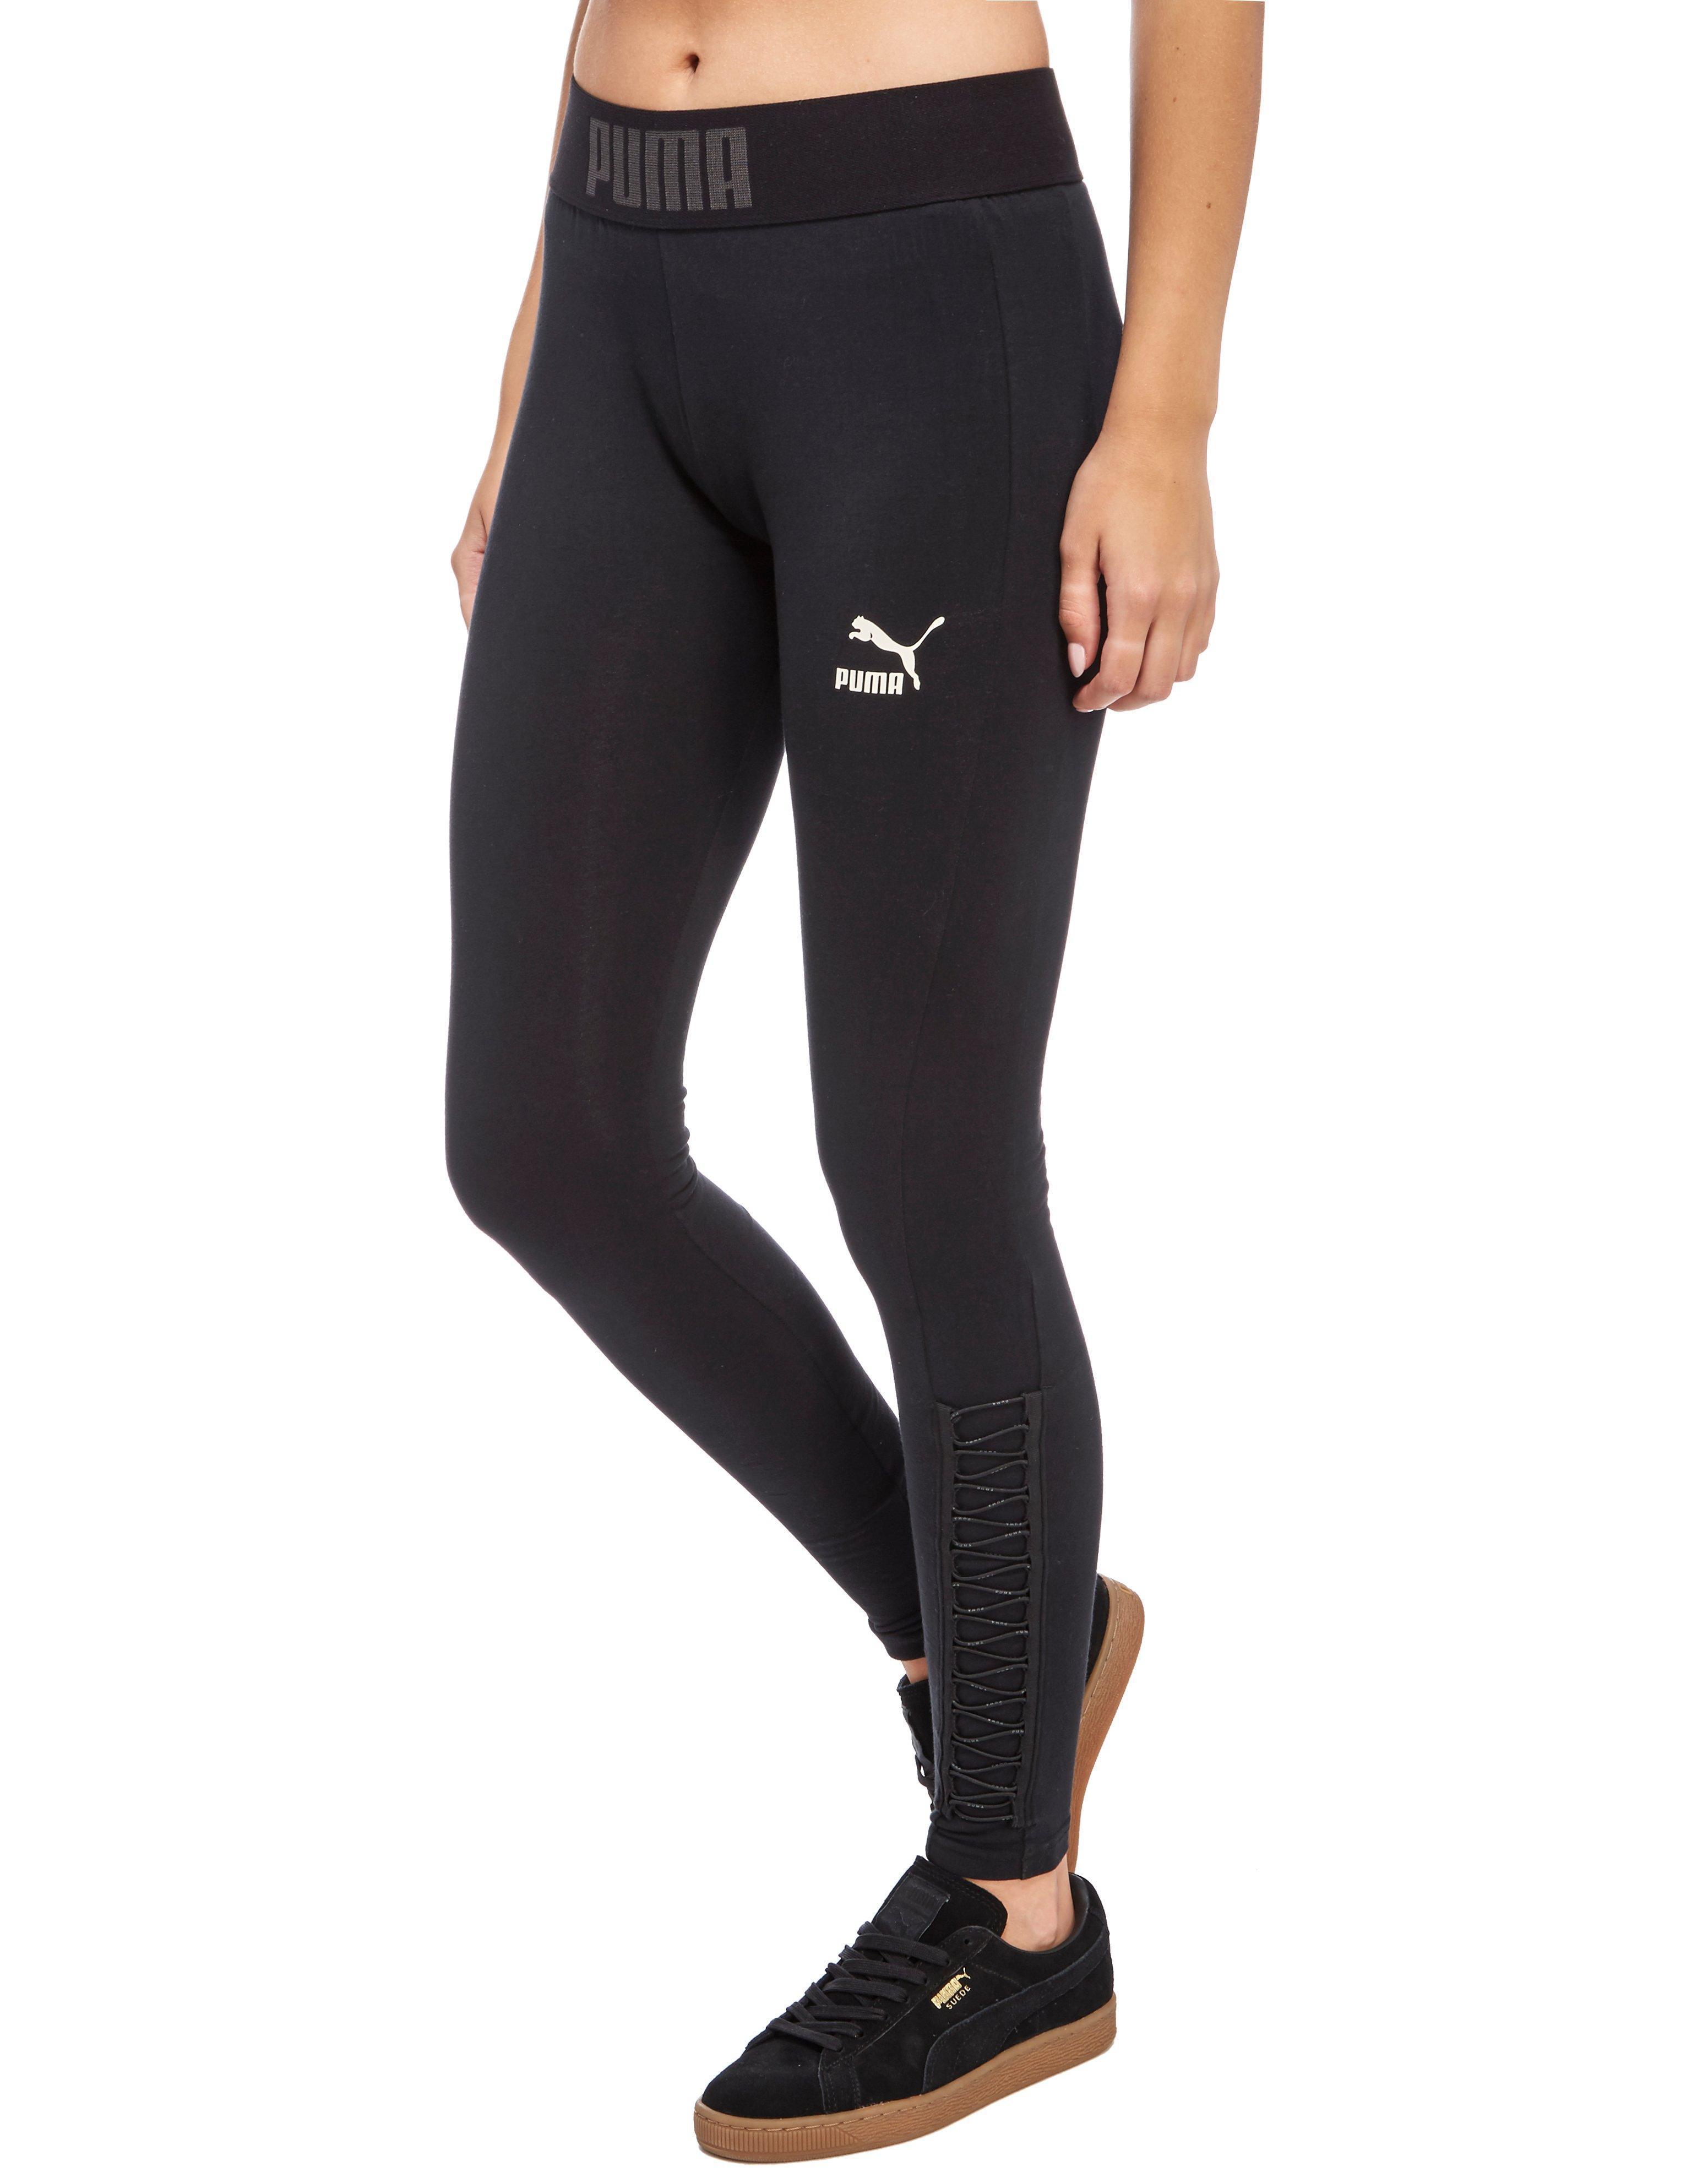 Puma Lace Up Leggings in Black | Lyst